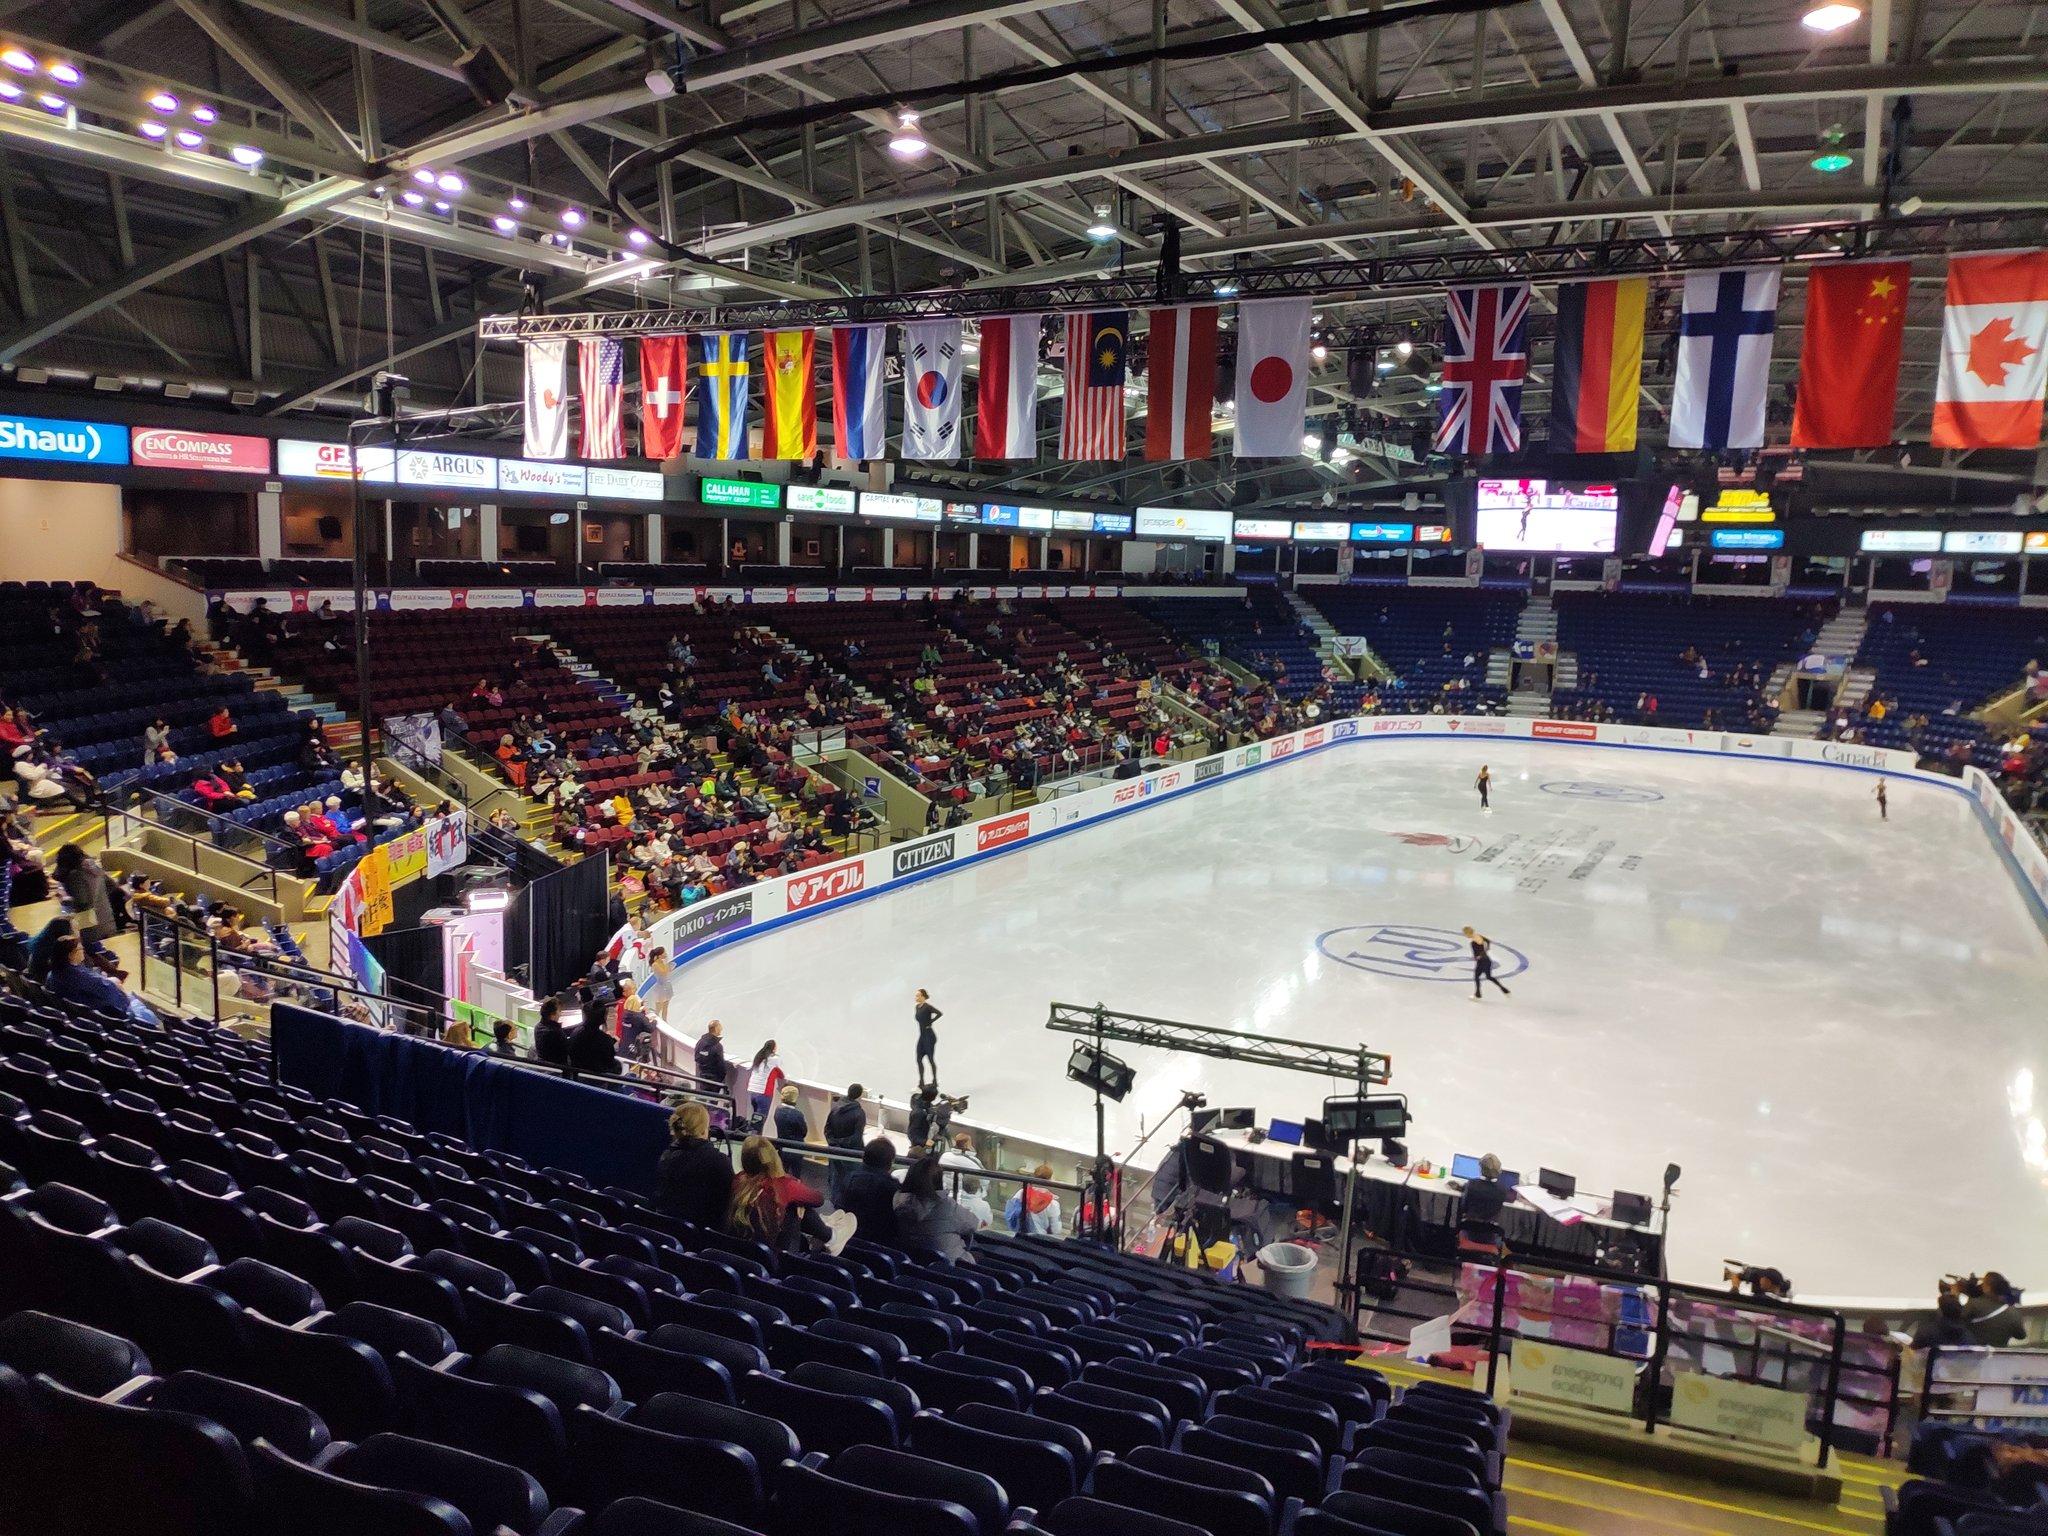 GP - 2 этап. Skate Canada International Kelowna, BC / CAN October 25-27, 2019 - Страница 4 EHsn_jHUEAAlSmC?format=jpg&name=4096x4096